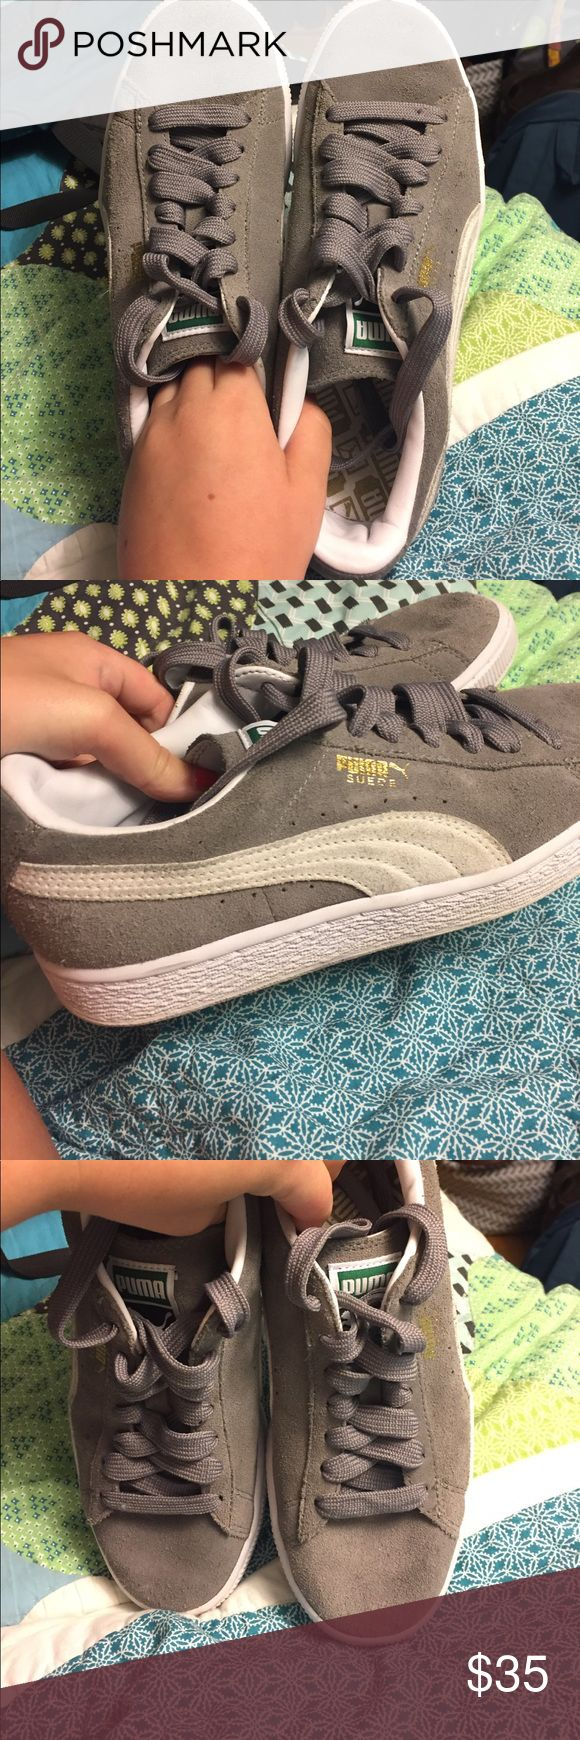 Puma Suede Casual Sneakers Size men's 5, women's 7 Puma Shoes Sneakers